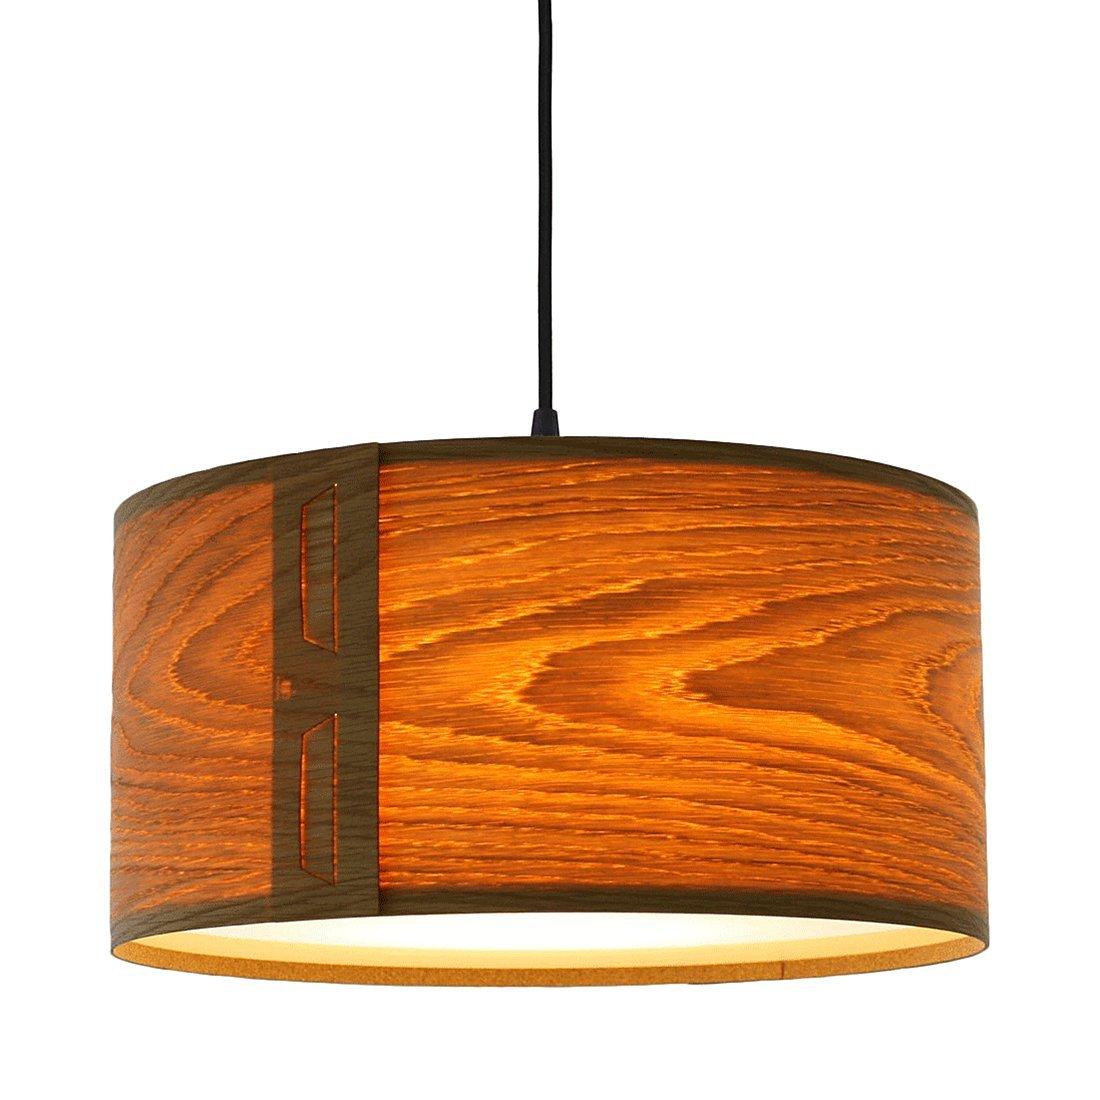 GARAGEEIGHT Design Lampenschirm Tab Von John Green, Eiche 0012001:  Amazon.de: Beleuchtung